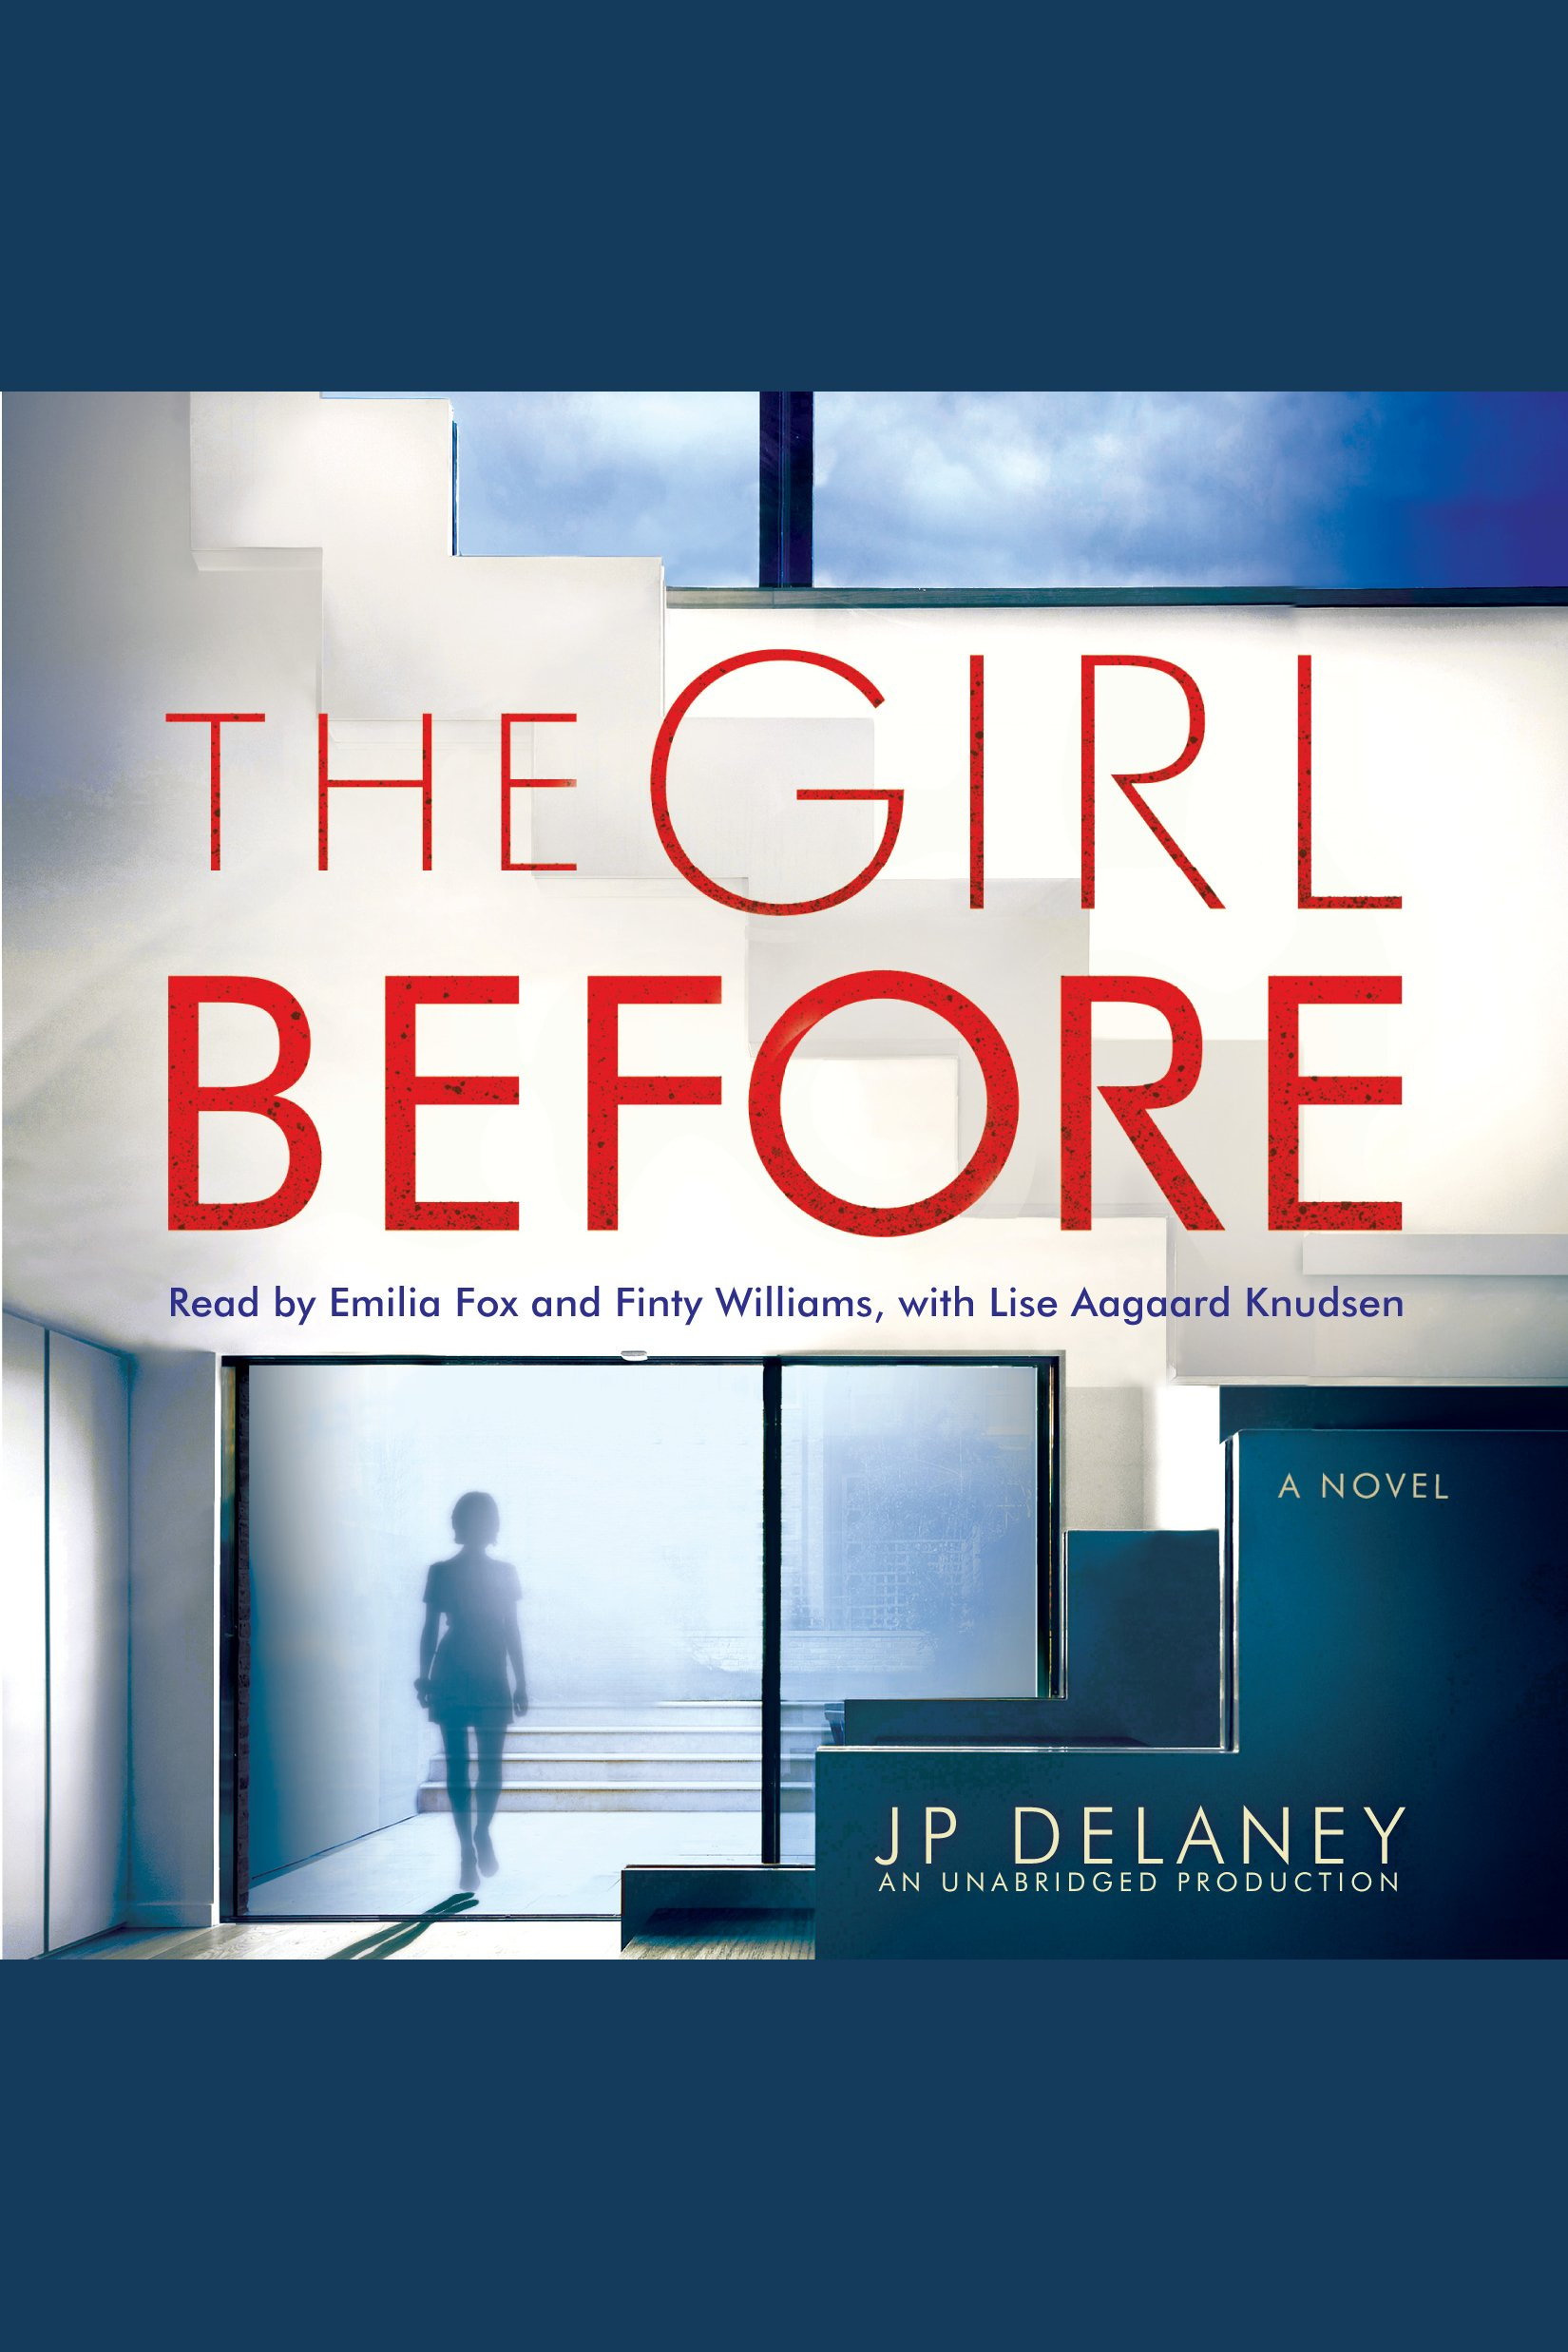 The Girl Before [AUDIO EBOOK] A Novel